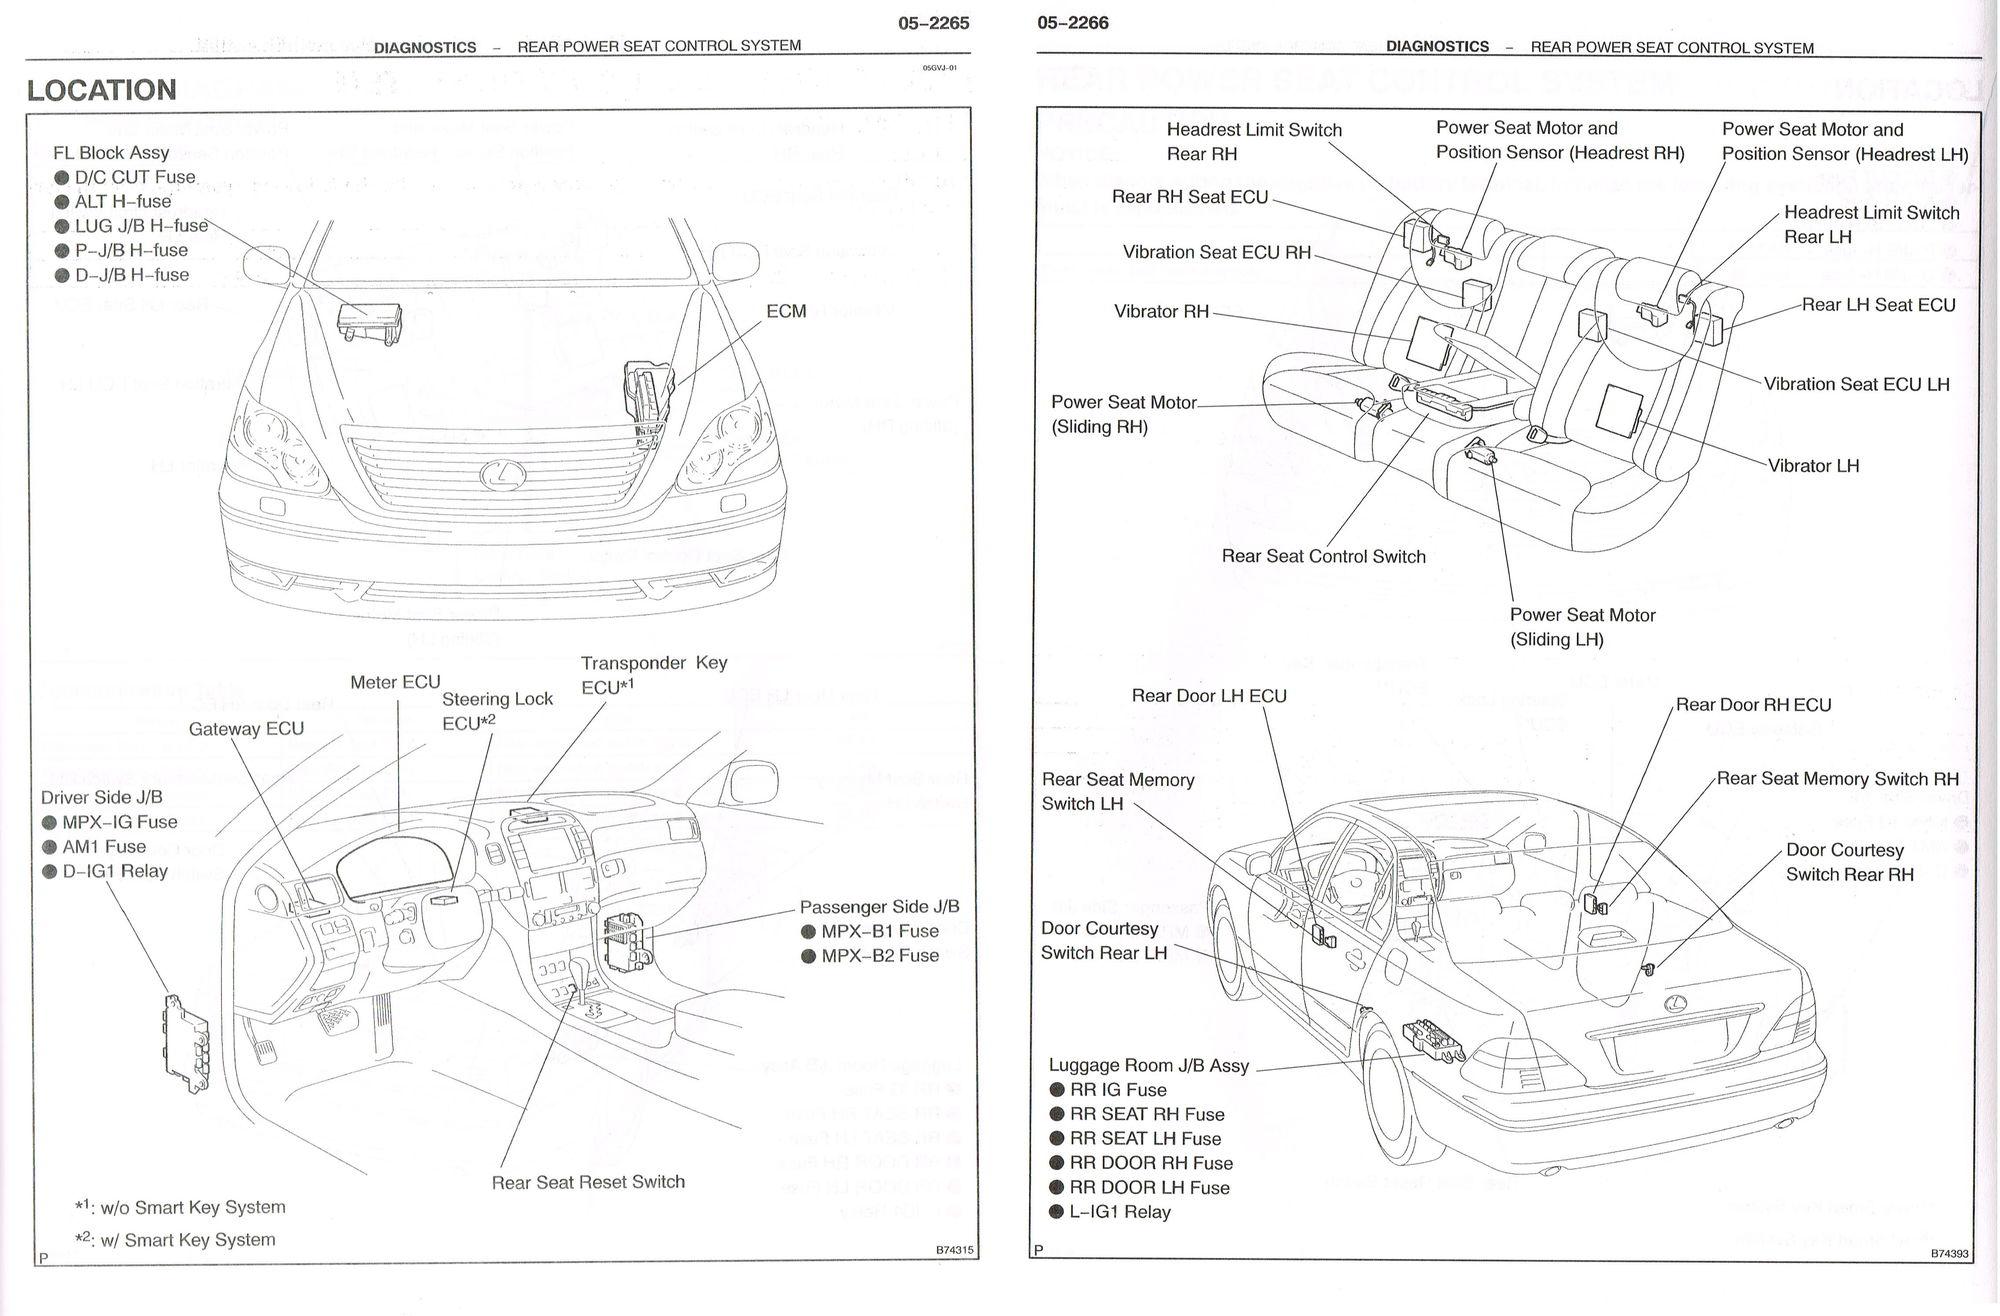 Lexus Gx470 Radio Wiring Diagram. Lexus. Auto Wiring Diagram